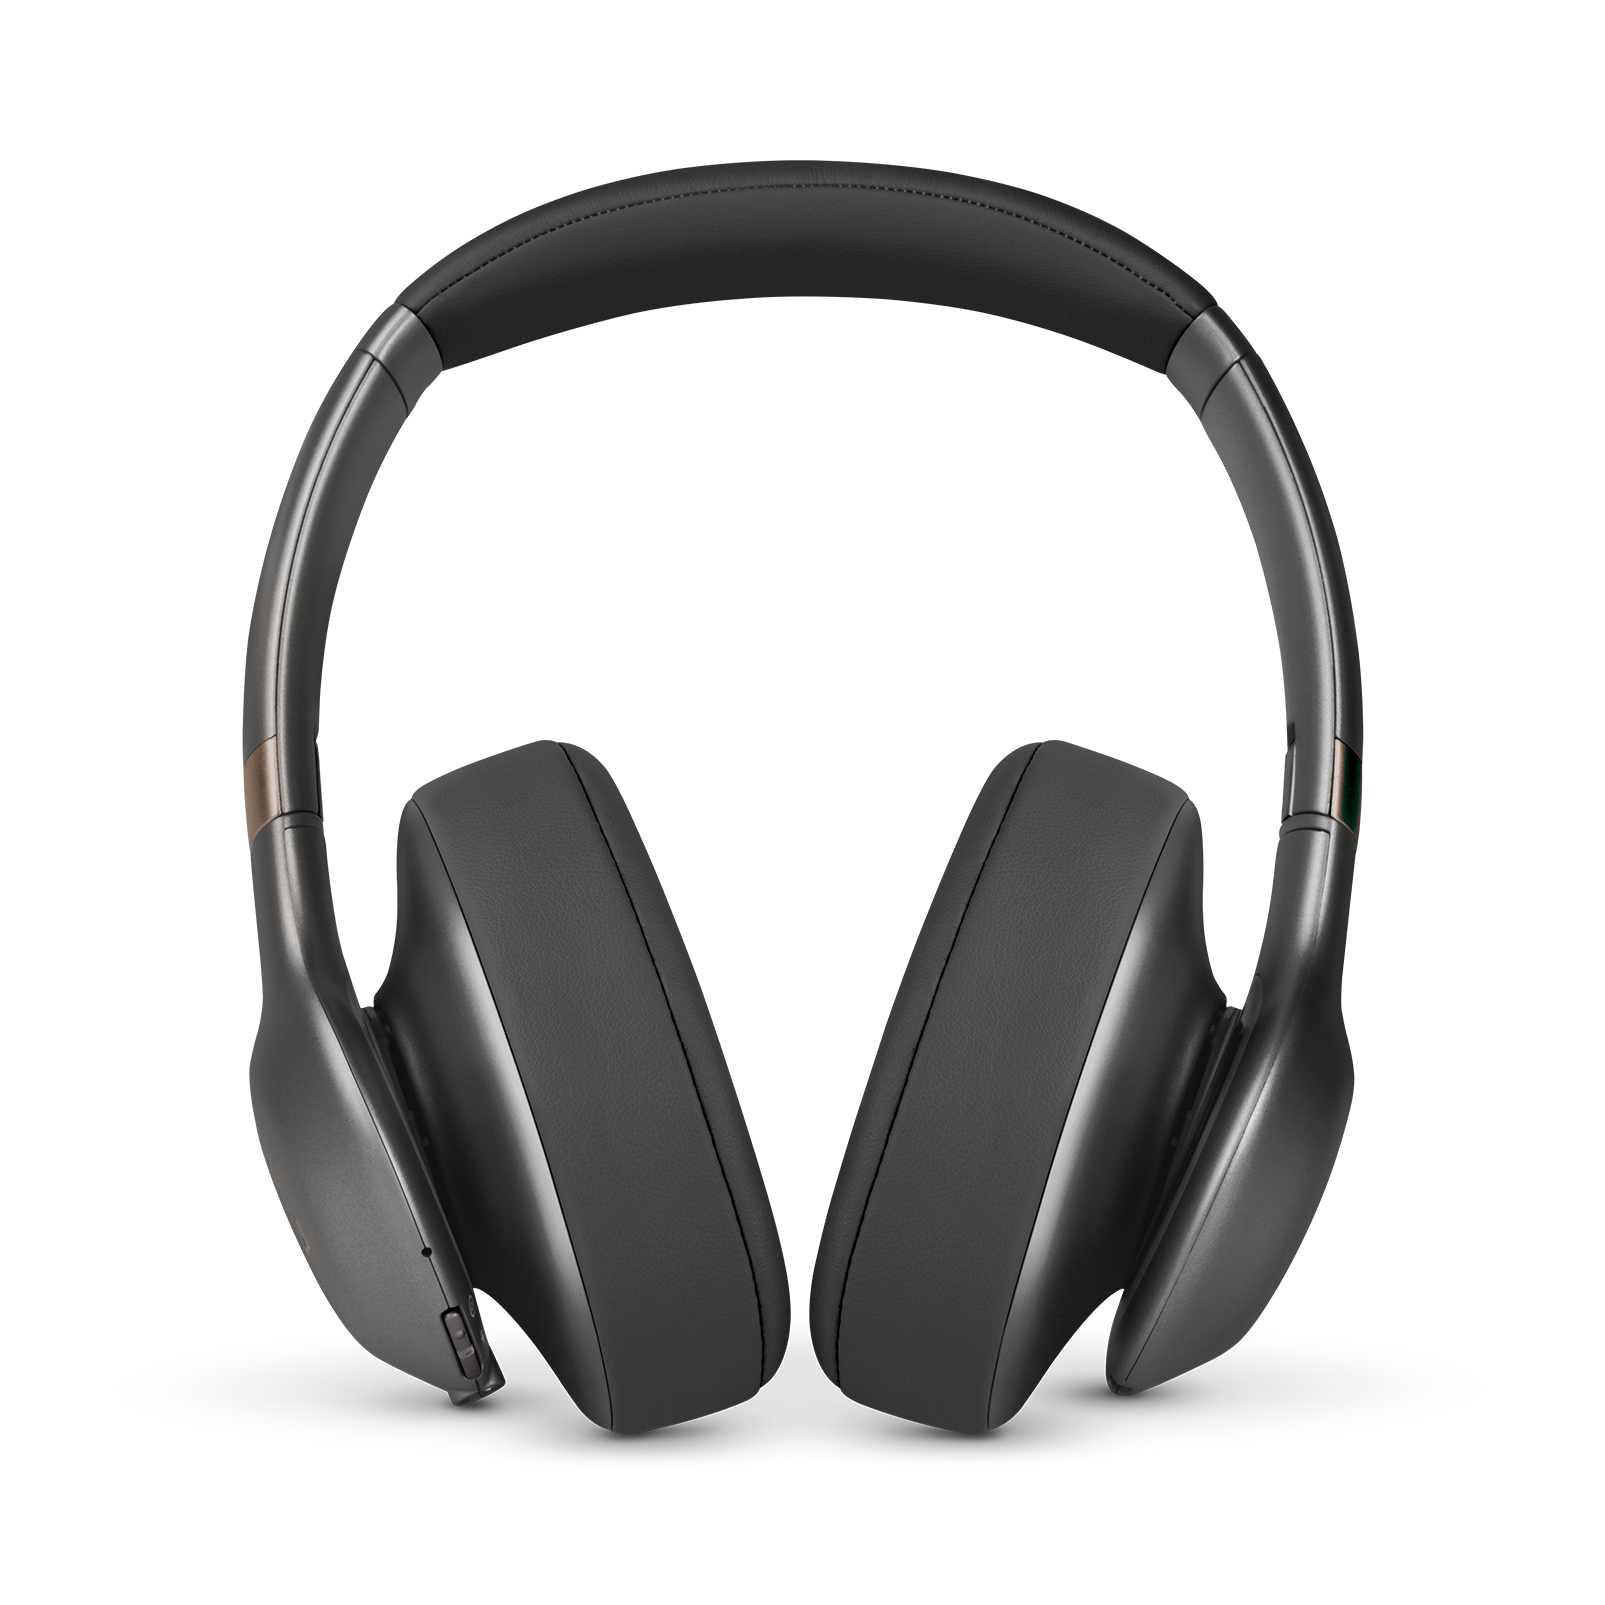 Fone de Ouvido Bluetooth JBL Everest 710GA - Cinza JBLV710GABTGML